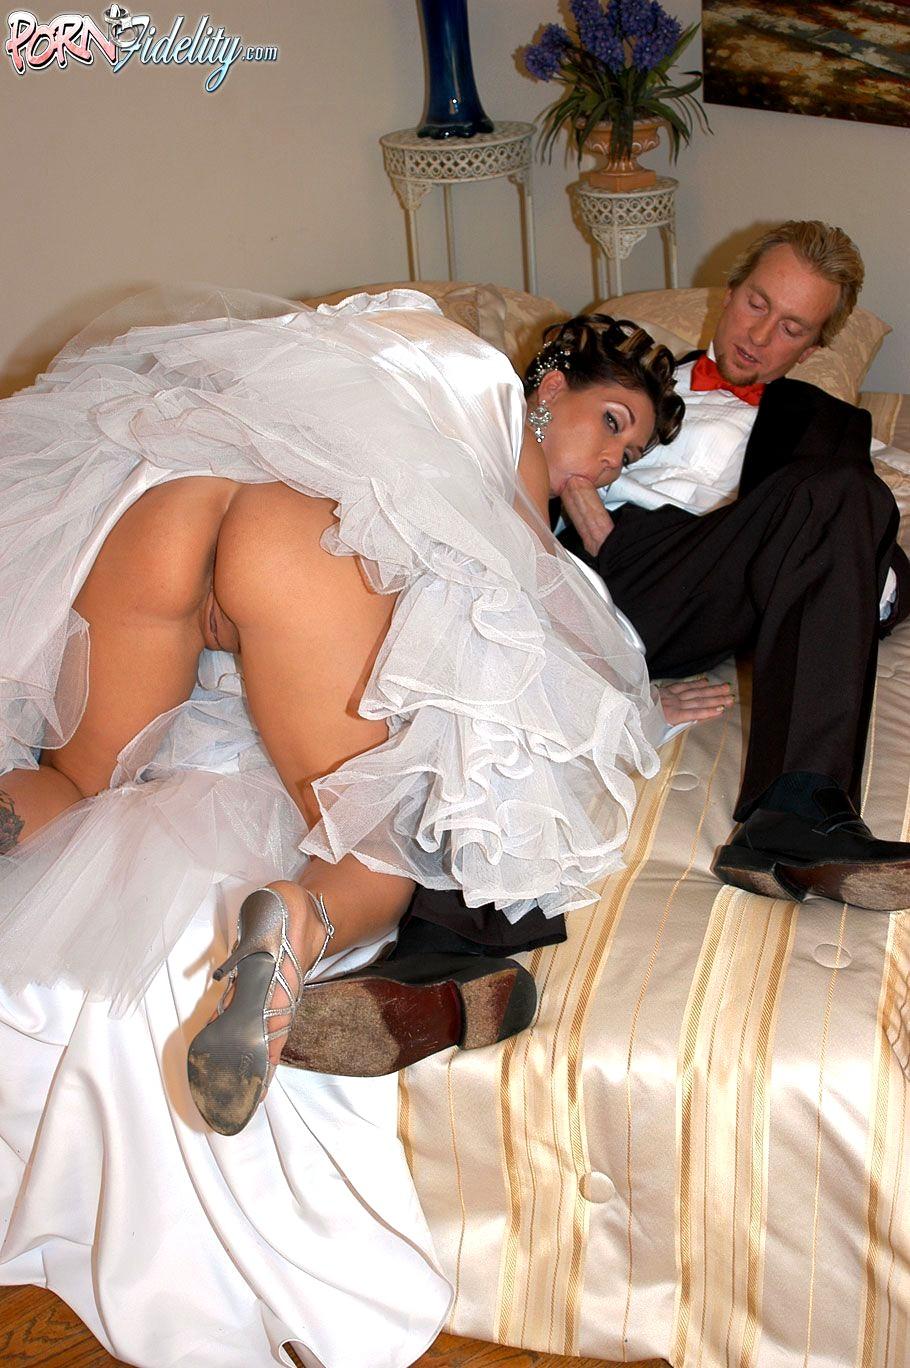 Bride cuckold captions